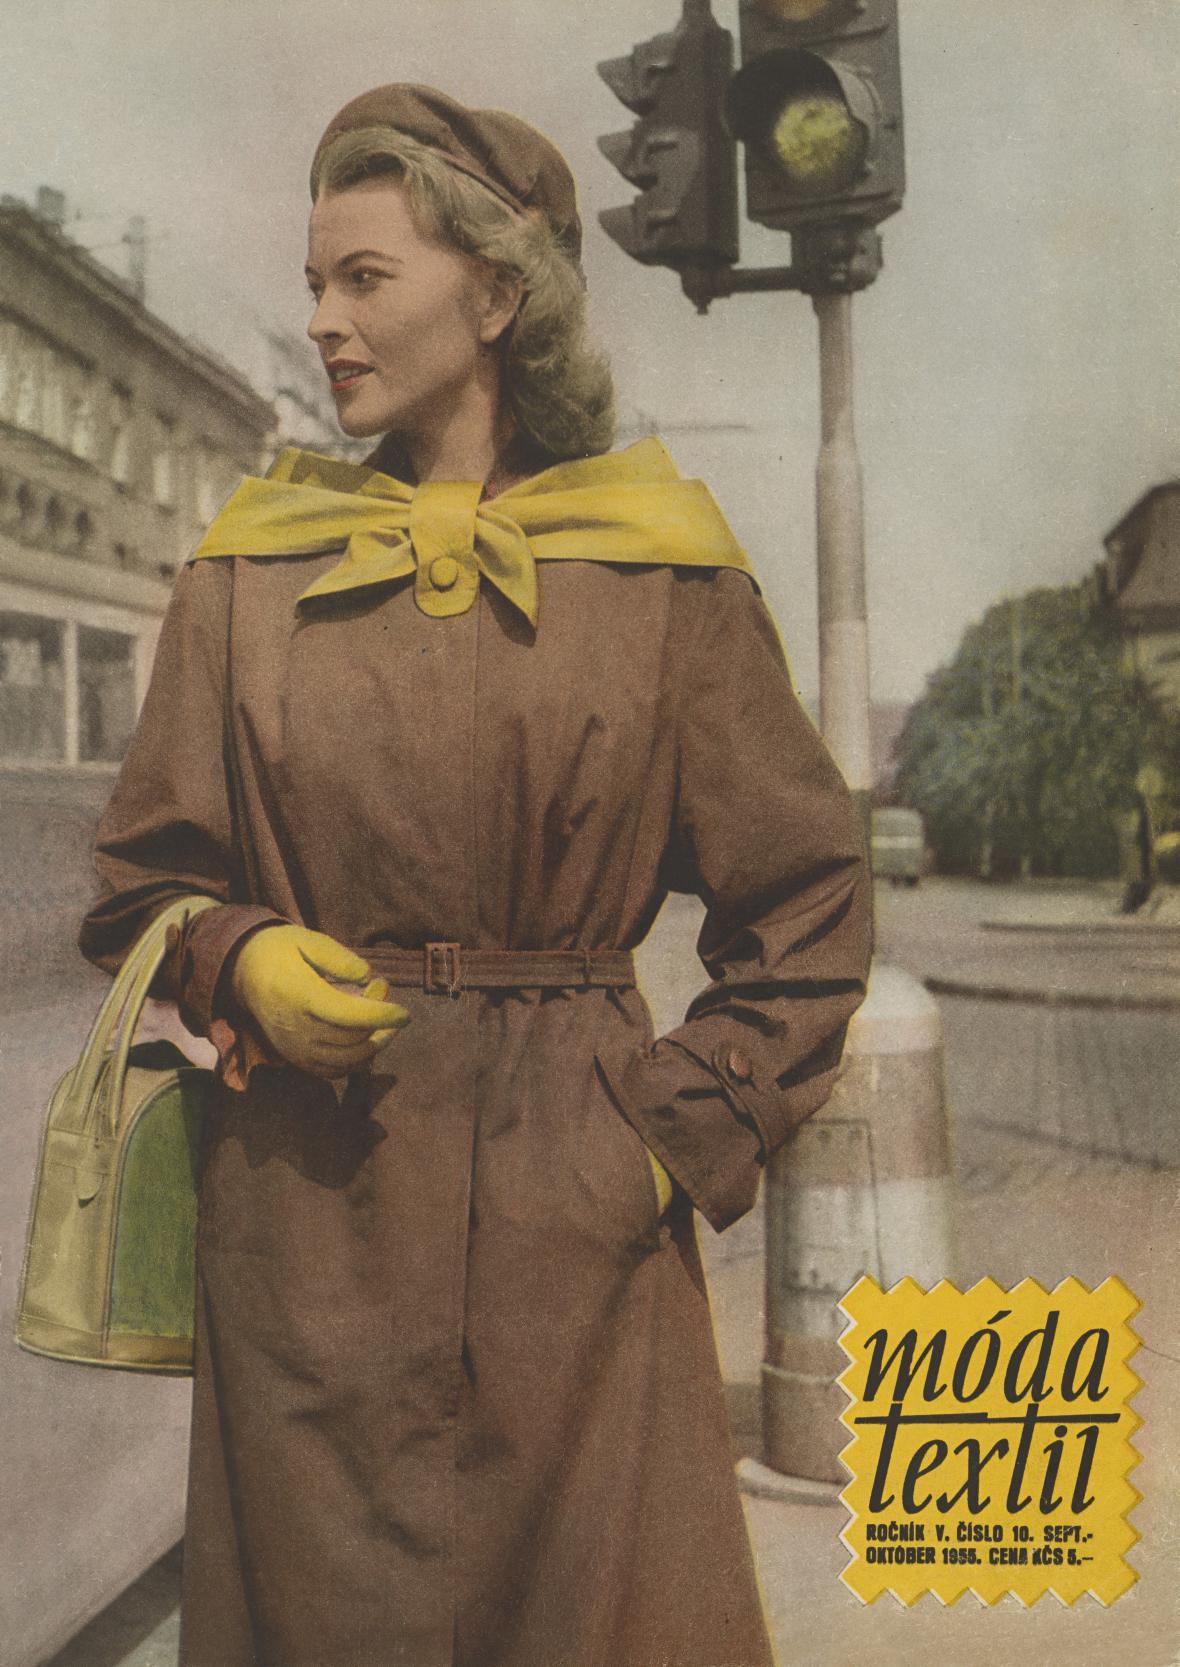 Móda – textil, V, 1955, č. 10. Oděv: Vycházkový plášť z bavlněného ripsu. Textilní tvorba, výrobné oddelení bavlna, Náchod